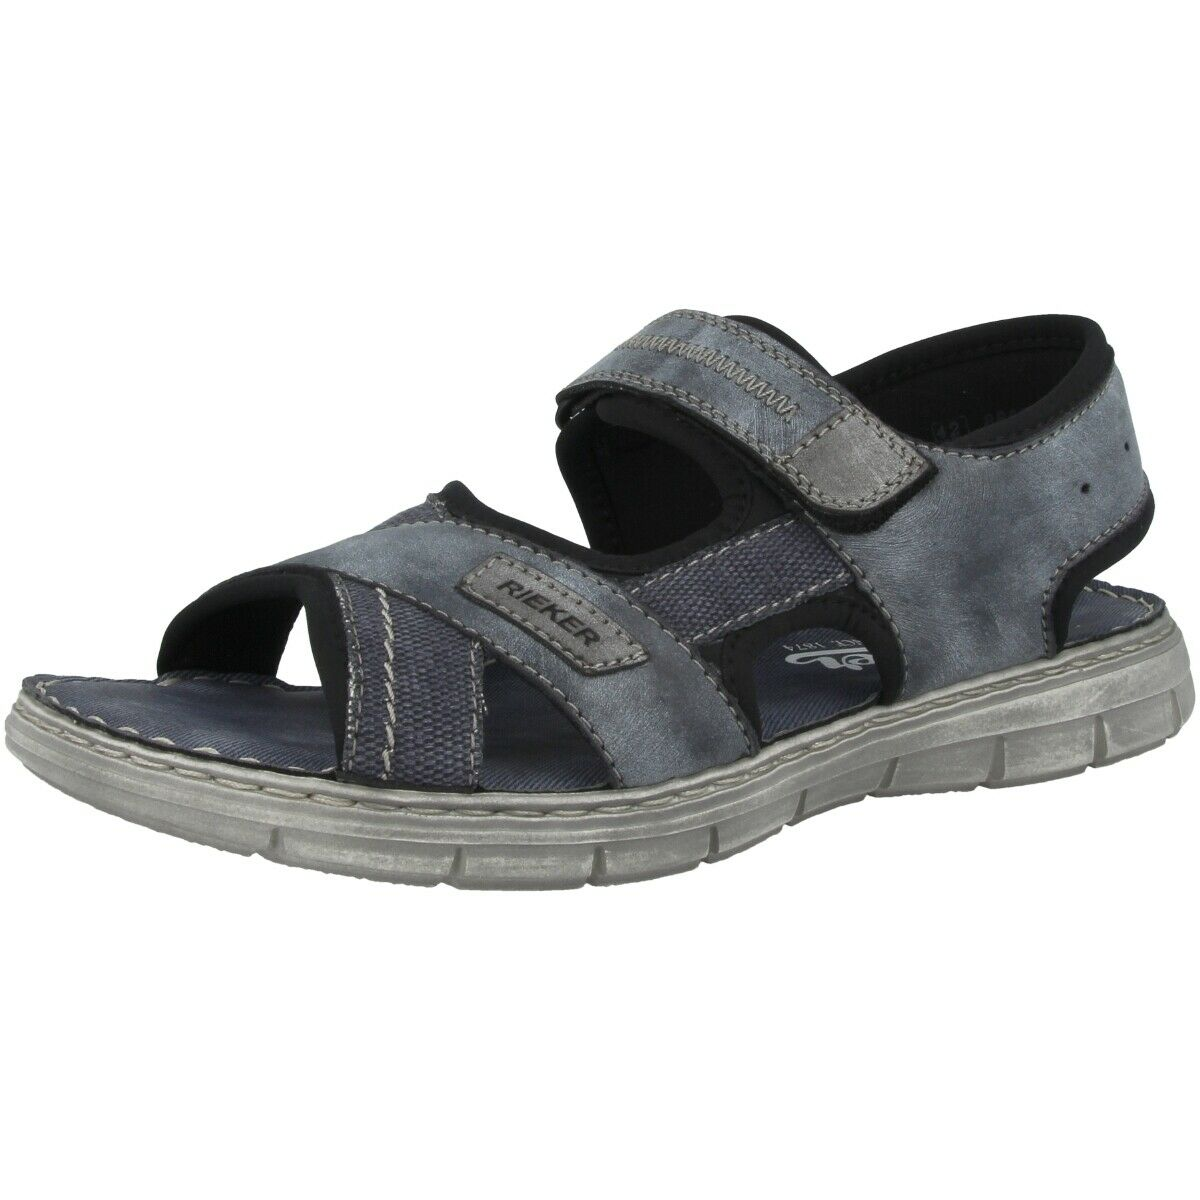 efc045805e3a Tessuto-Serbia-Serbia-Scuba Sandals Anti-stress shoes 25153-14 Rieker  nrnbij3752-Sandals